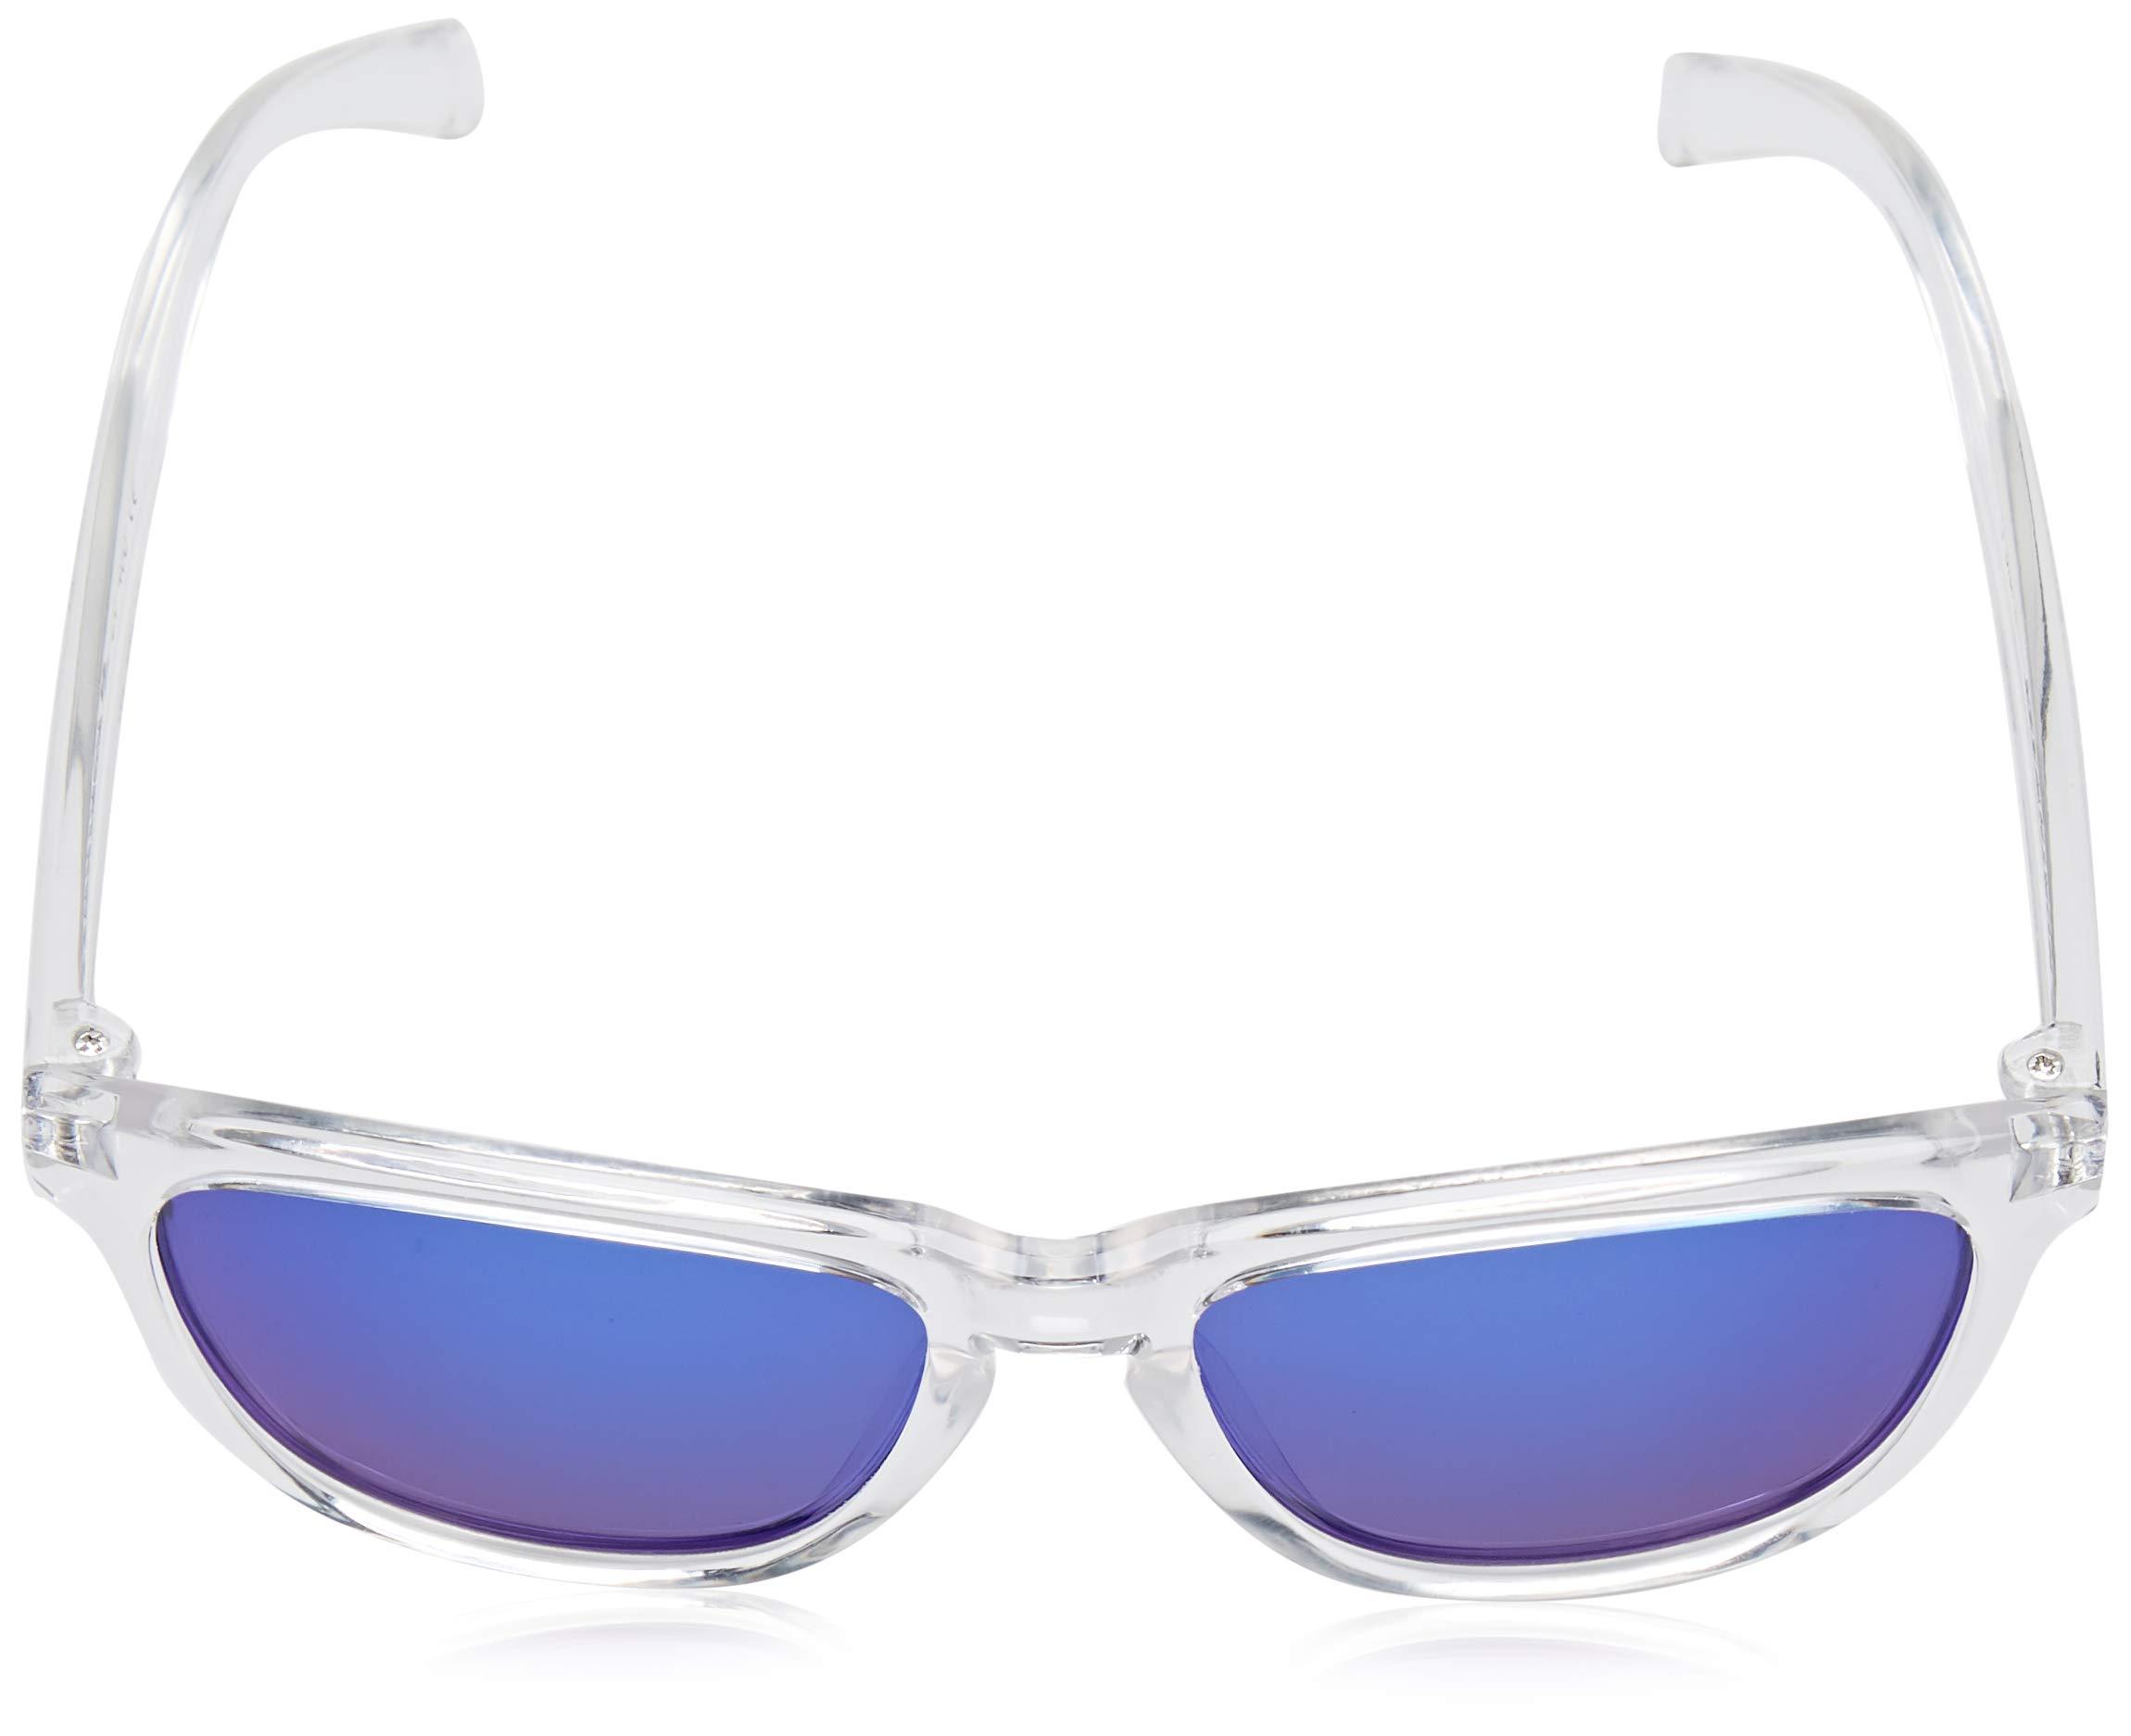 NORTHWEEK Kids Seabright - Gafas de Sol para Niño y Niña, Polarizadas, Translúcido/Azul 4